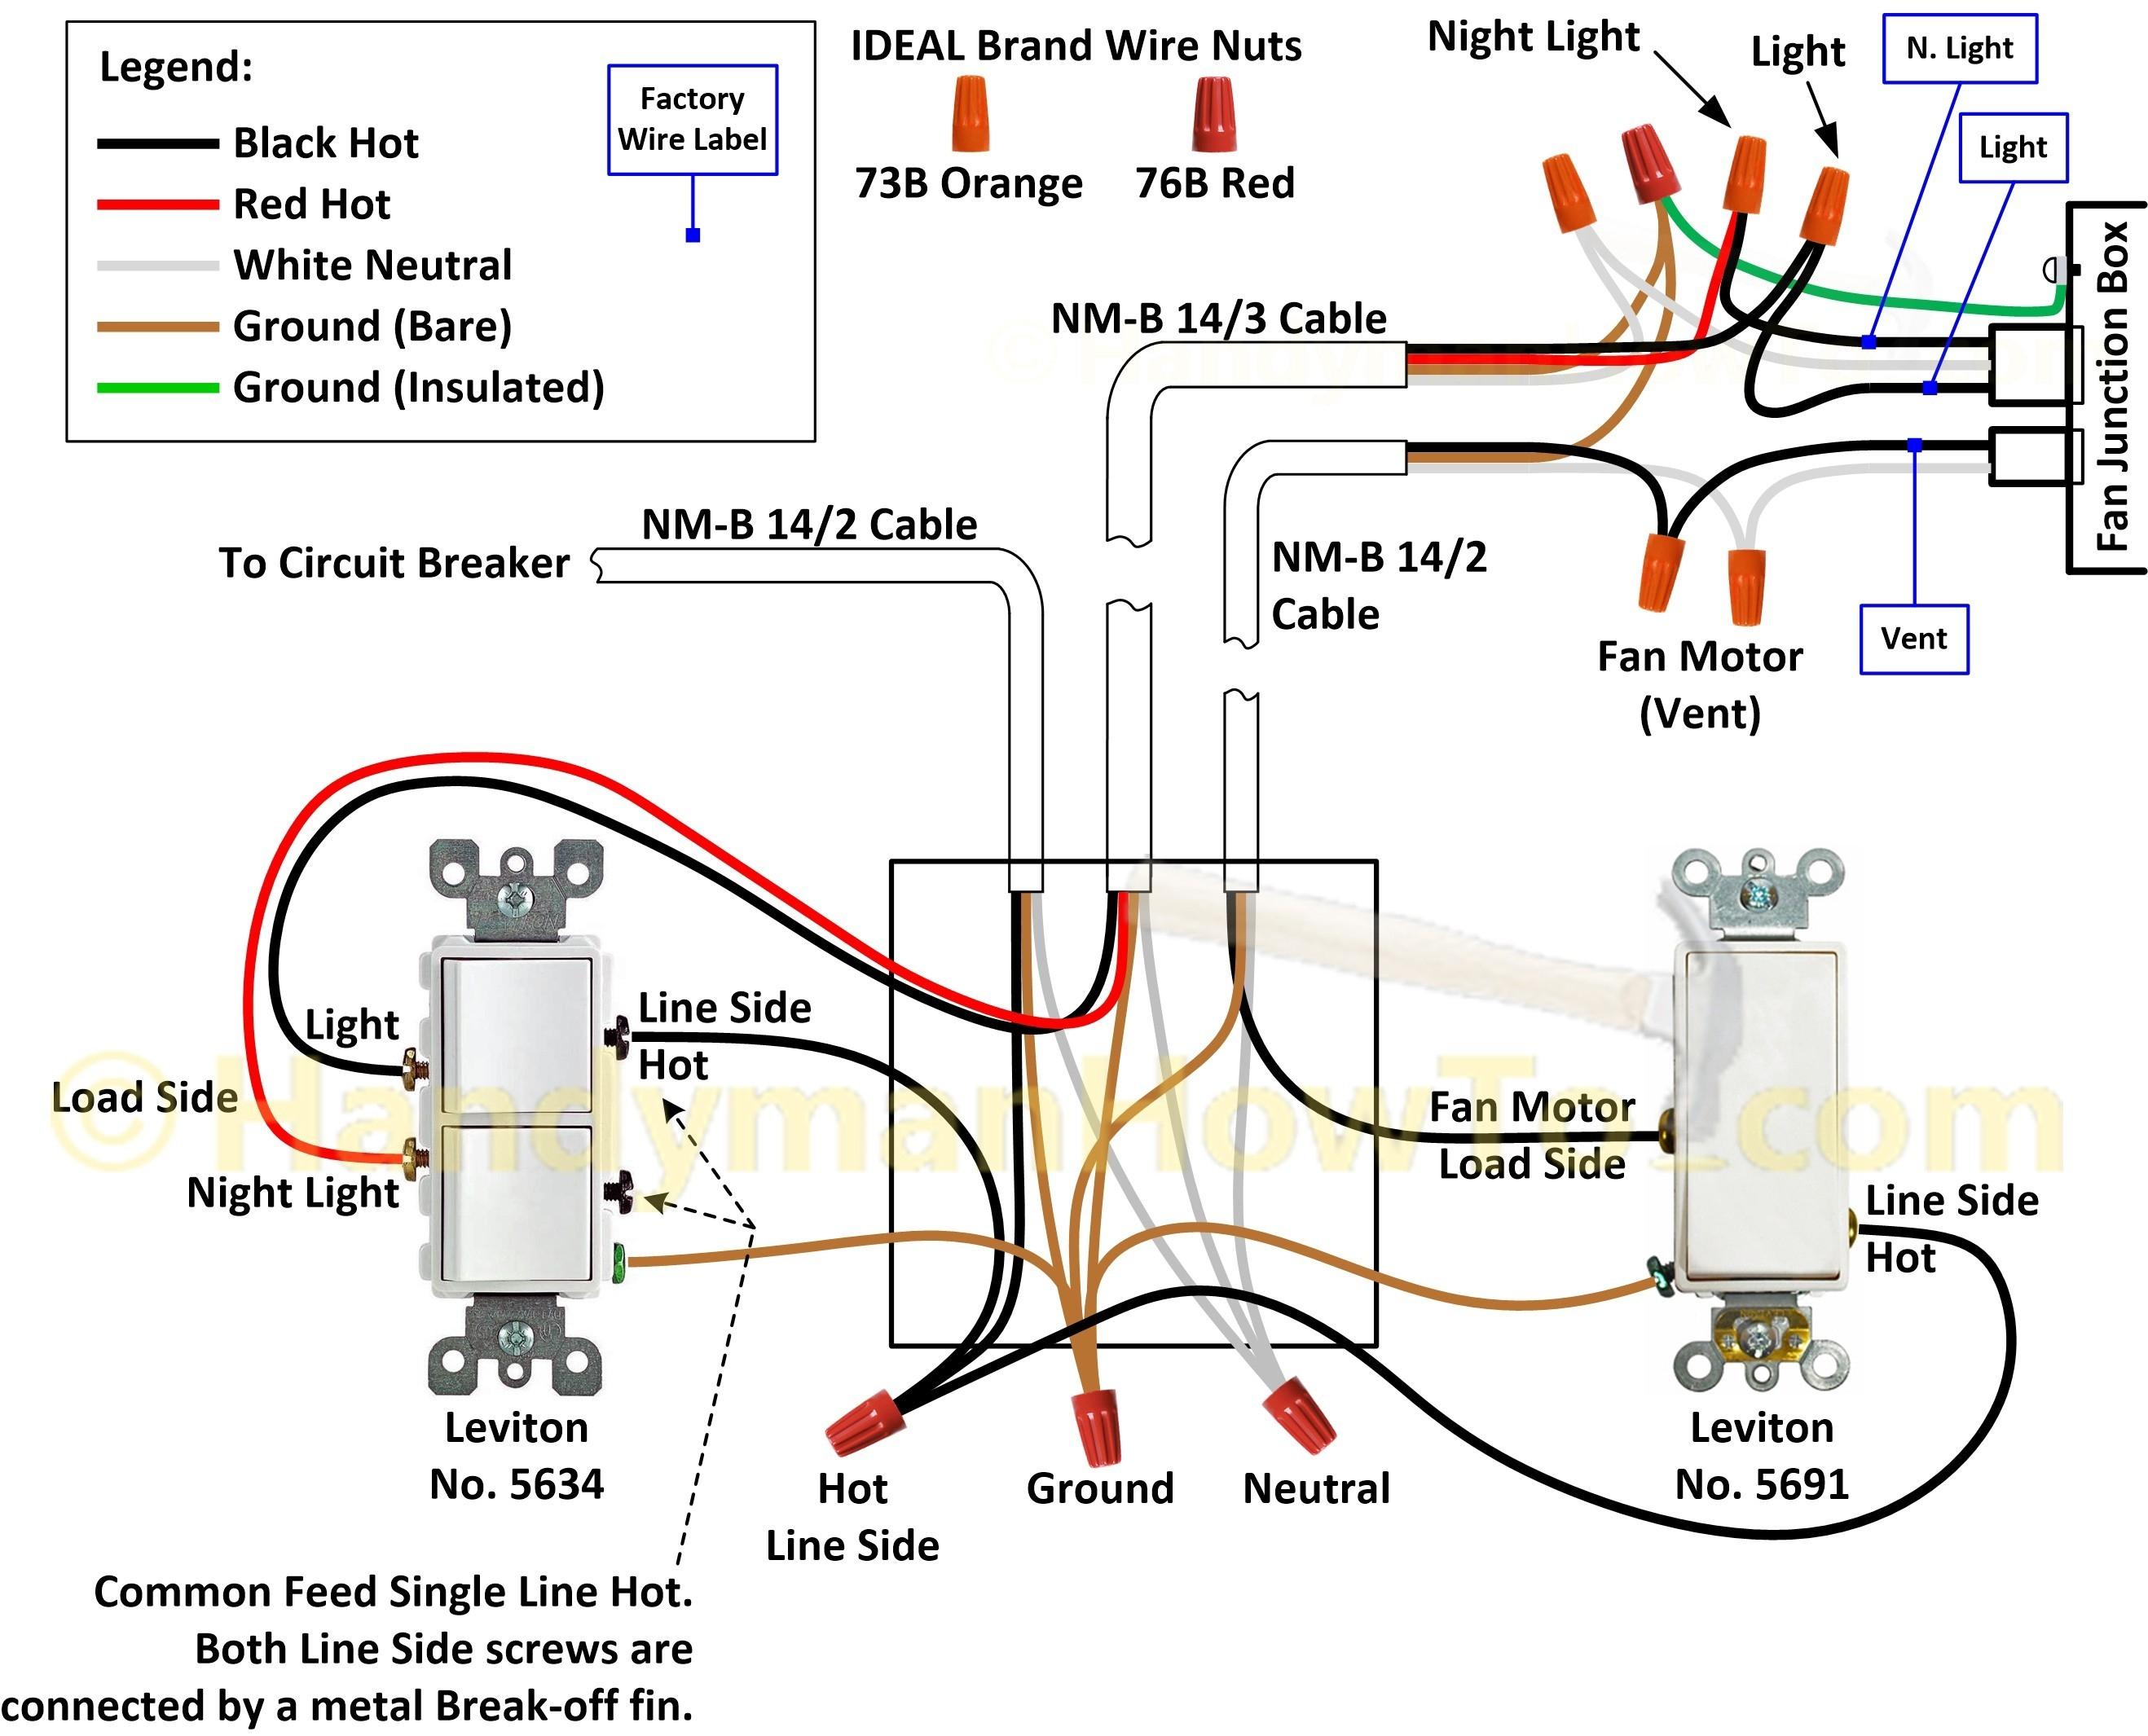 Recessed Wiring Diagram | Wiring Diagram - Recessed Lighting Wiring Diagram